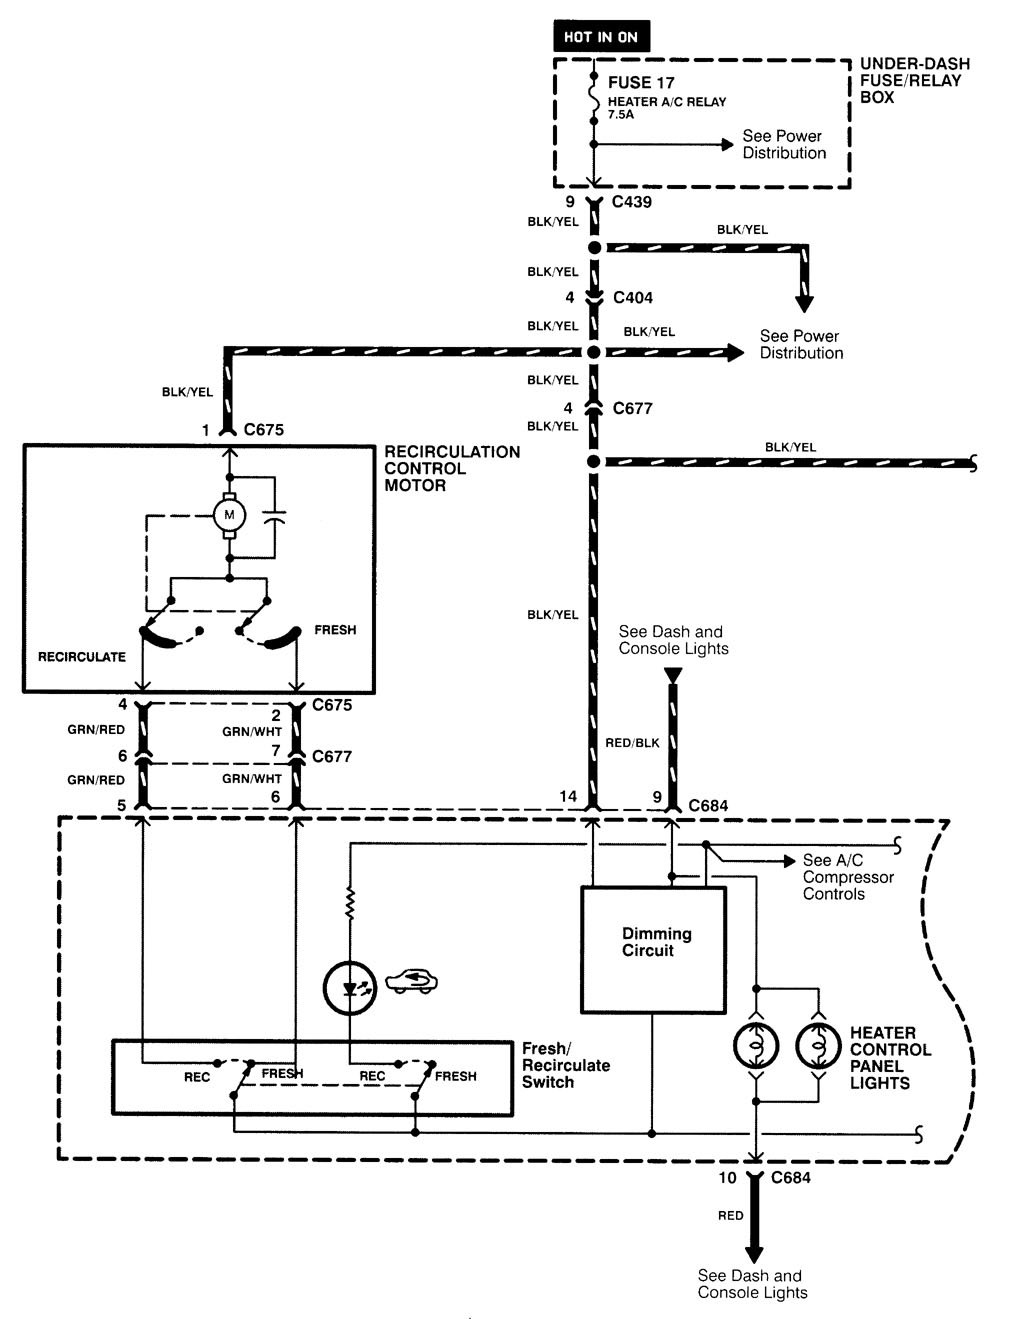 Acura Integra 1998 2001 Wiring Diagrams Hvac Control Wire Diagram Part 1